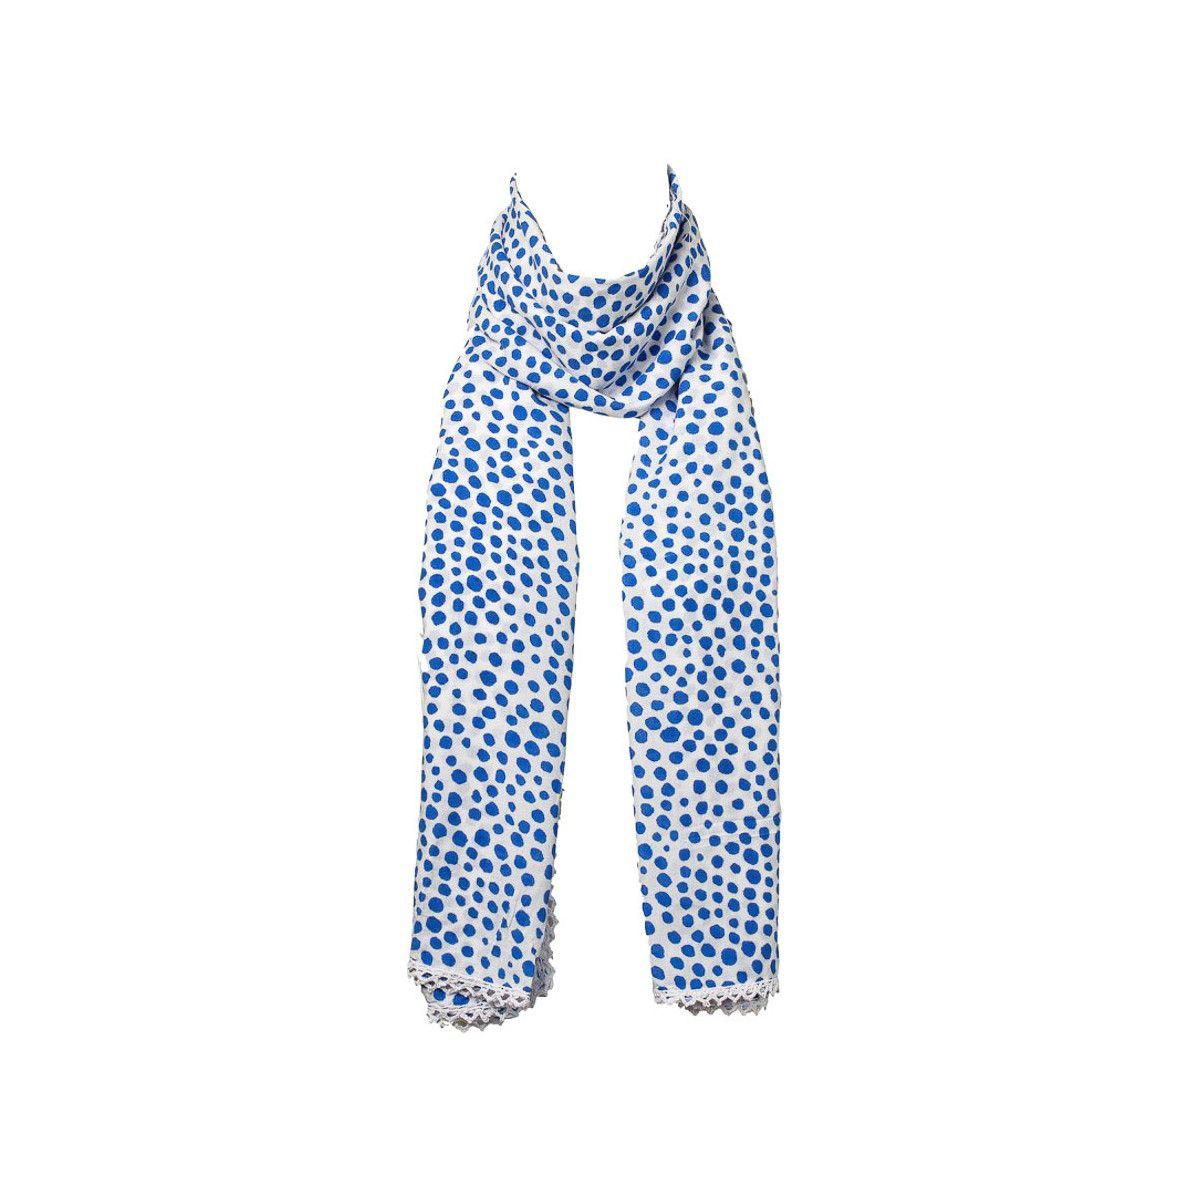 Chèche foulard femme coton blanc à pois bleu